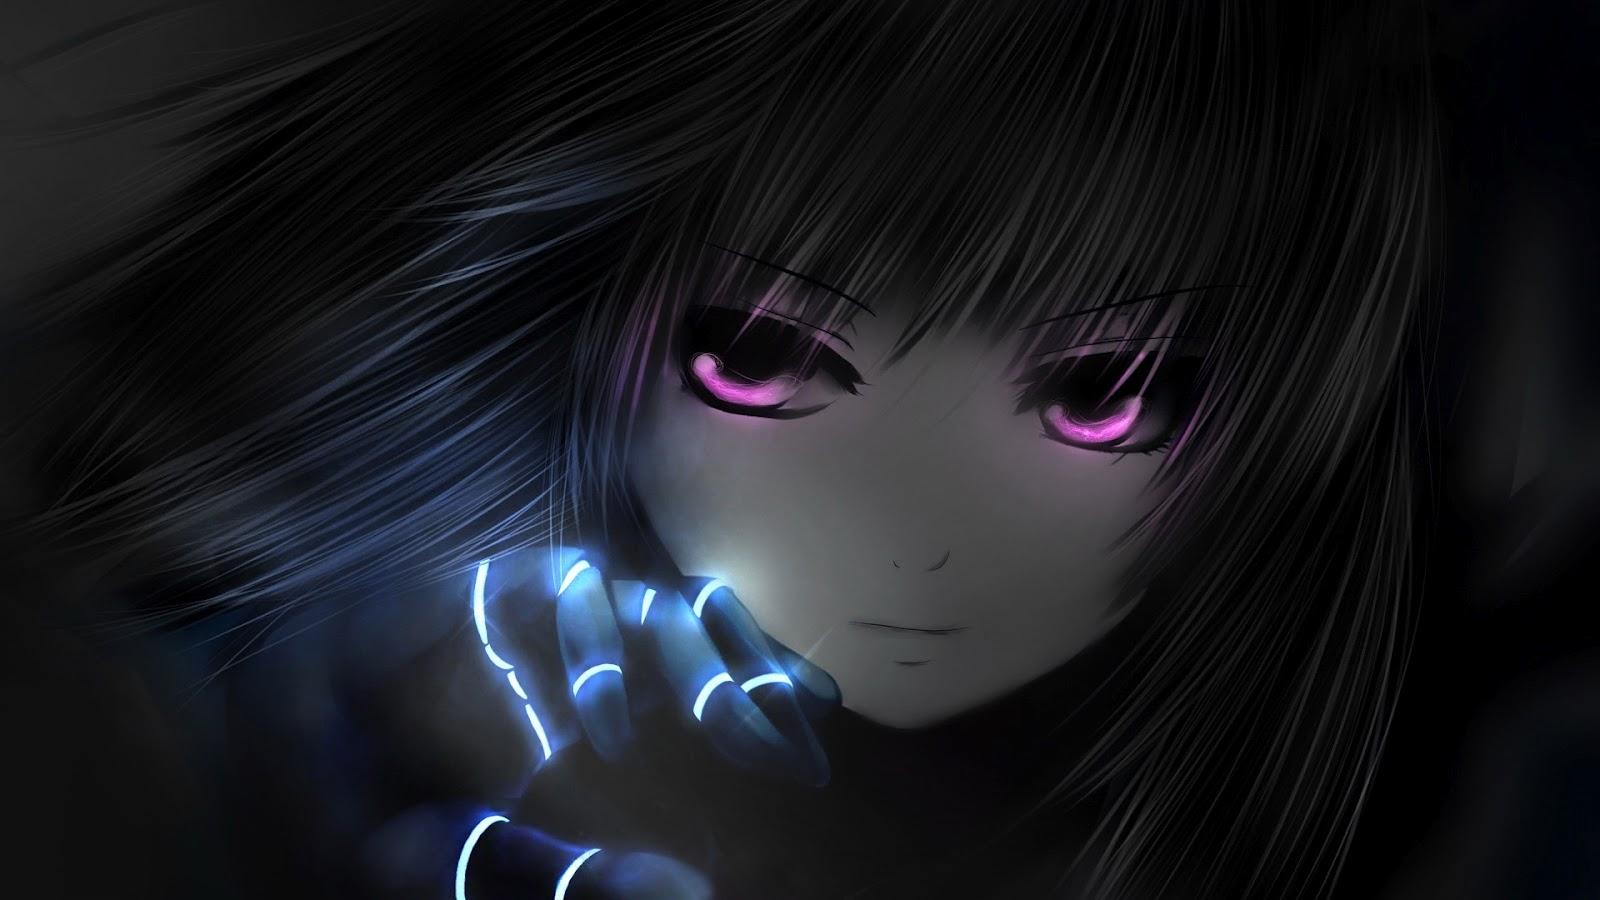 Dark night full hd desktop wallpapers 1080p - Wallpaper dark anime ...